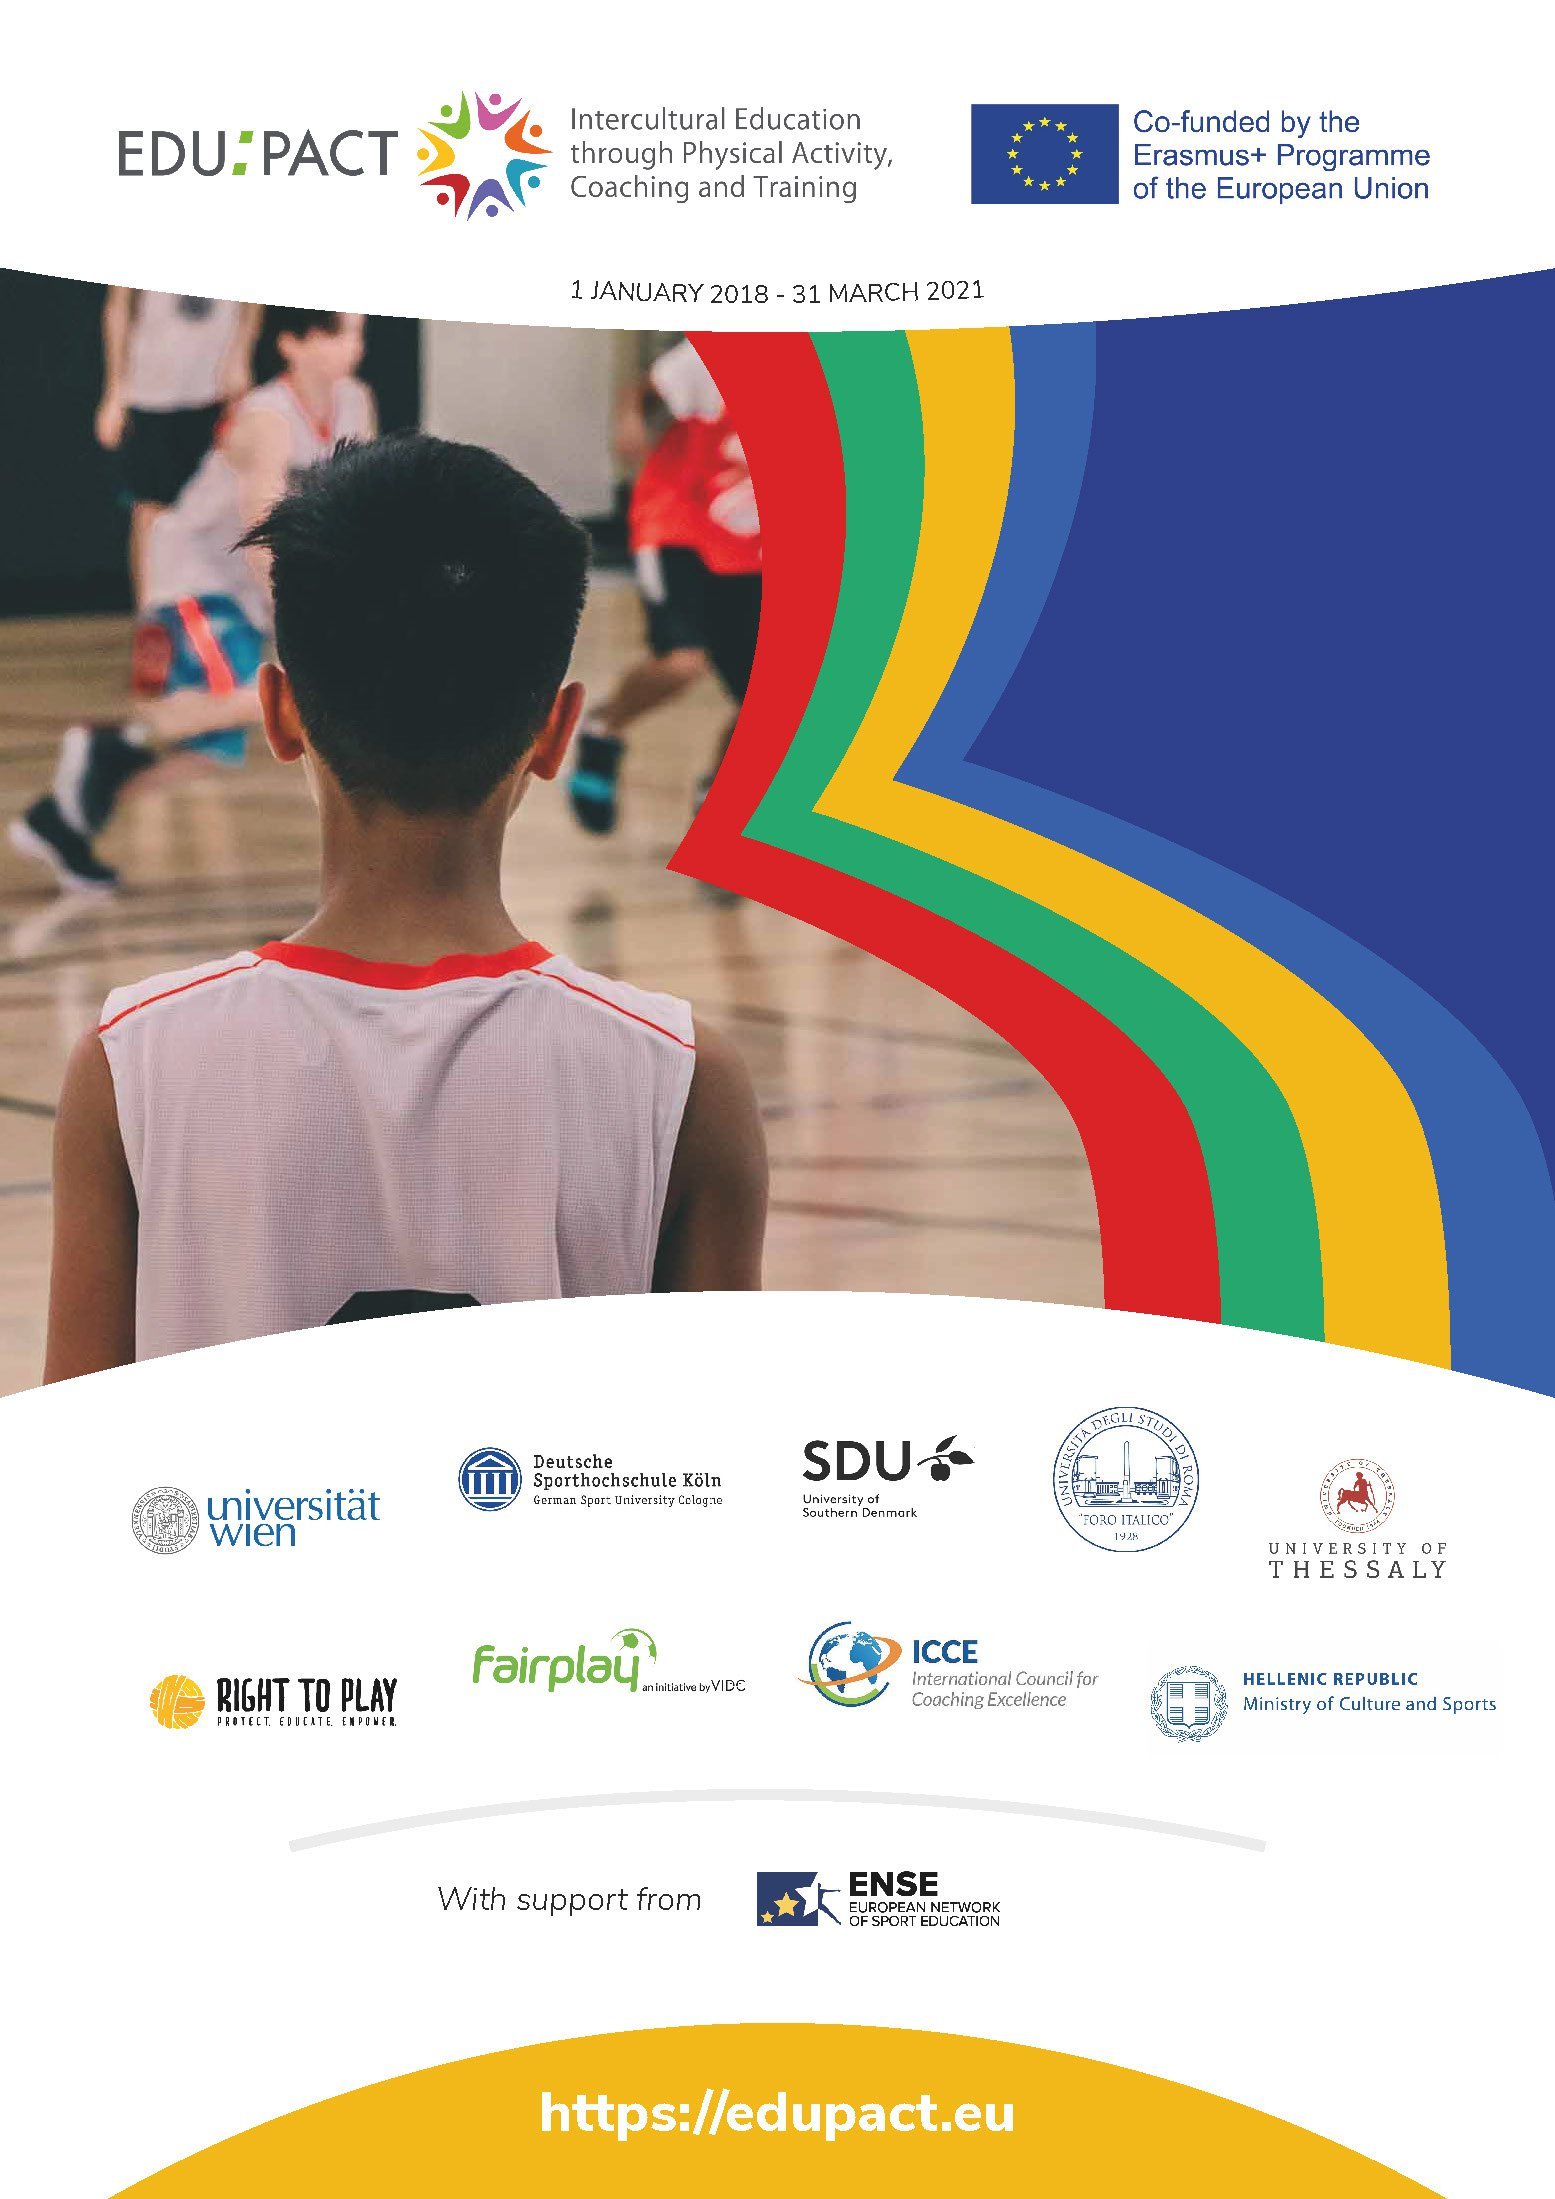 EDU:PACT Poster